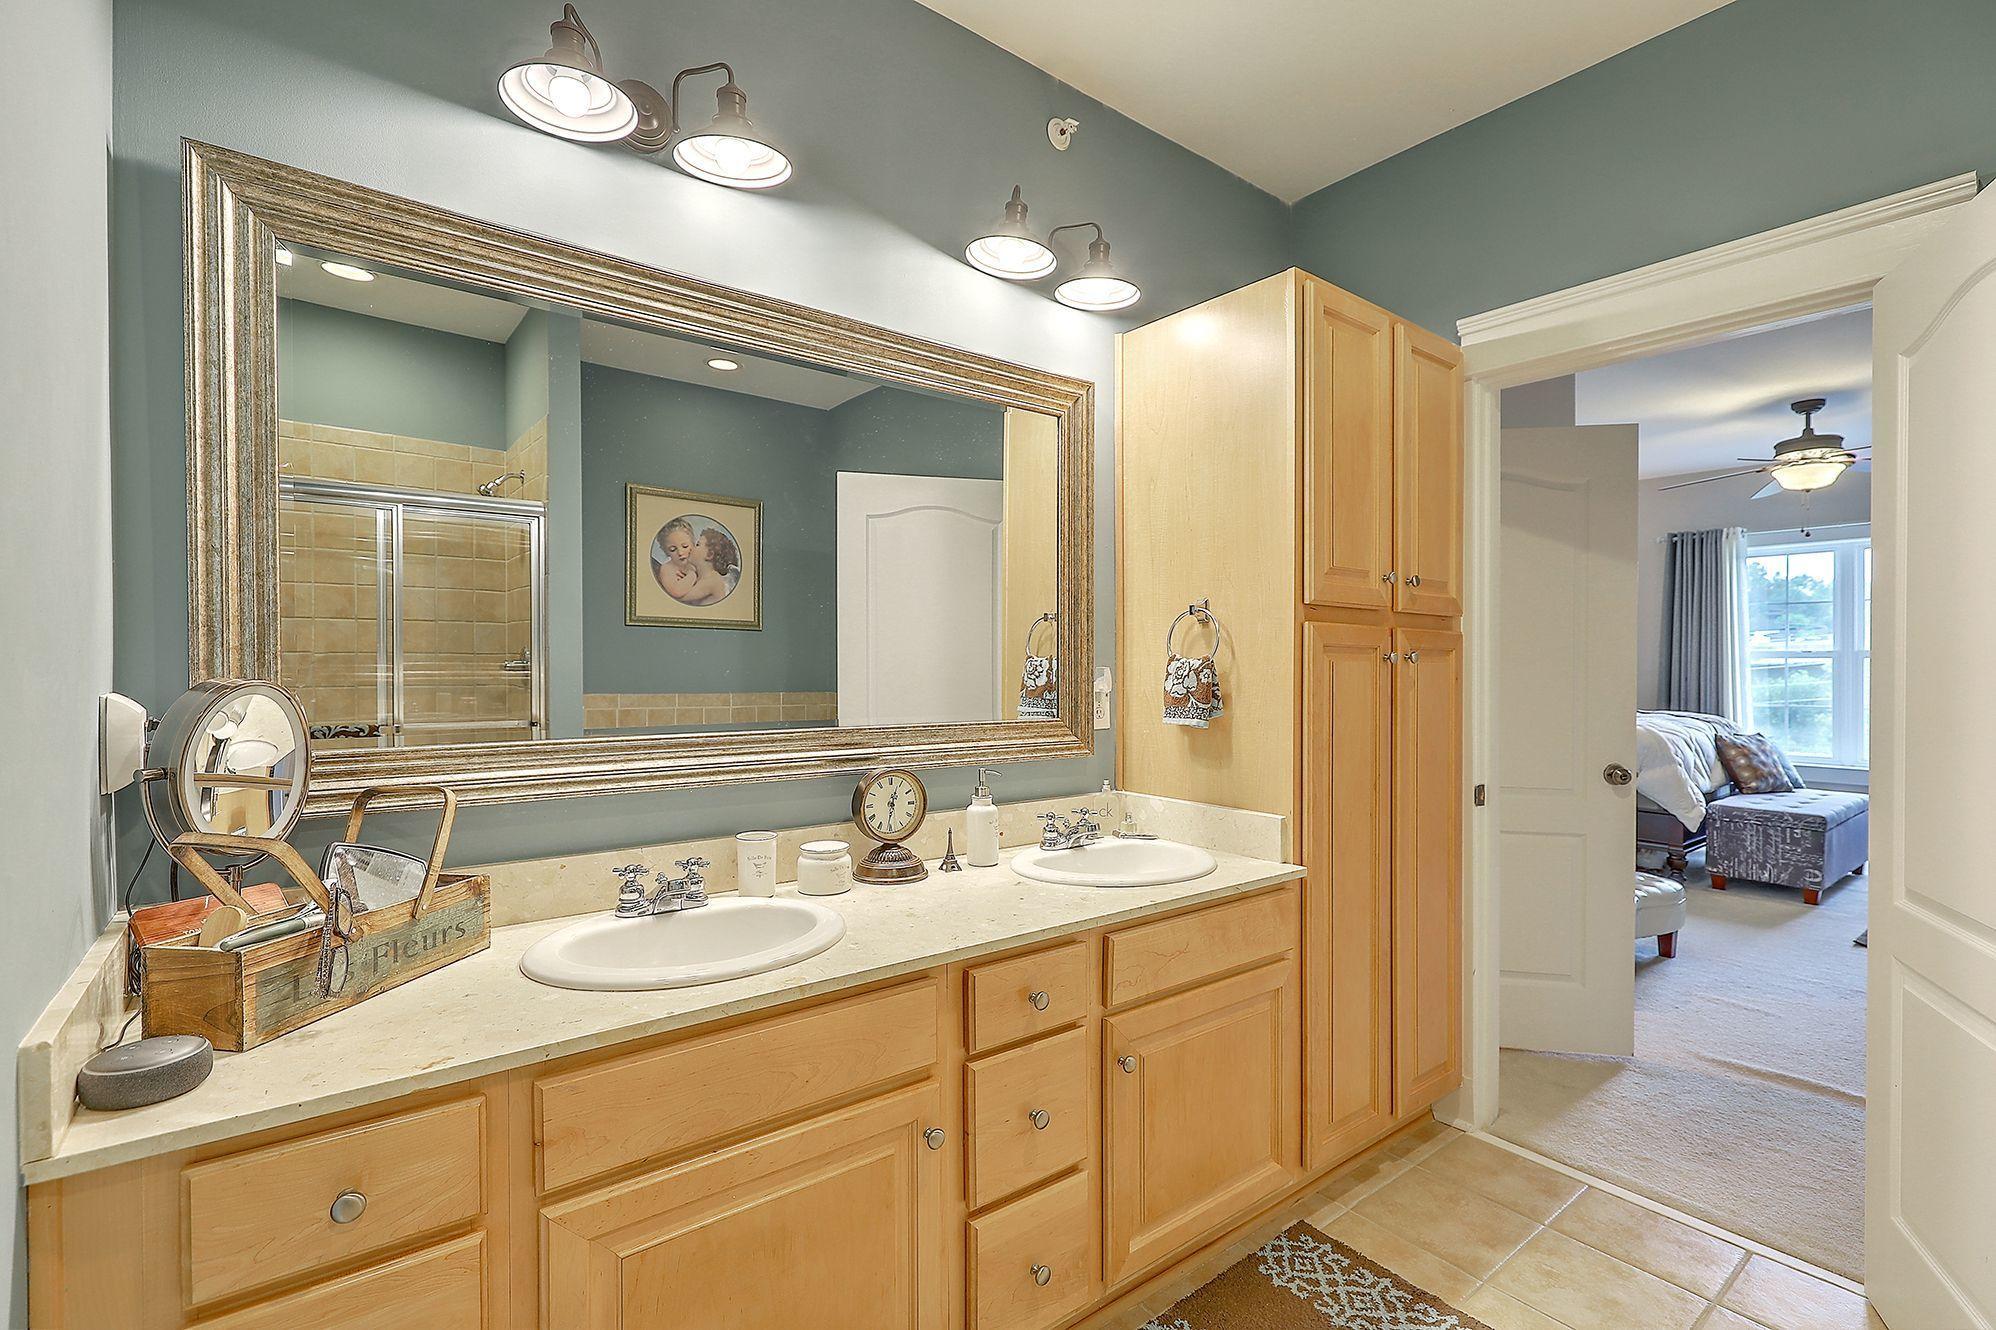 Etiwan Pointe Homes For Sale - 208 Etiwan Pointe, Mount Pleasant, SC - 17